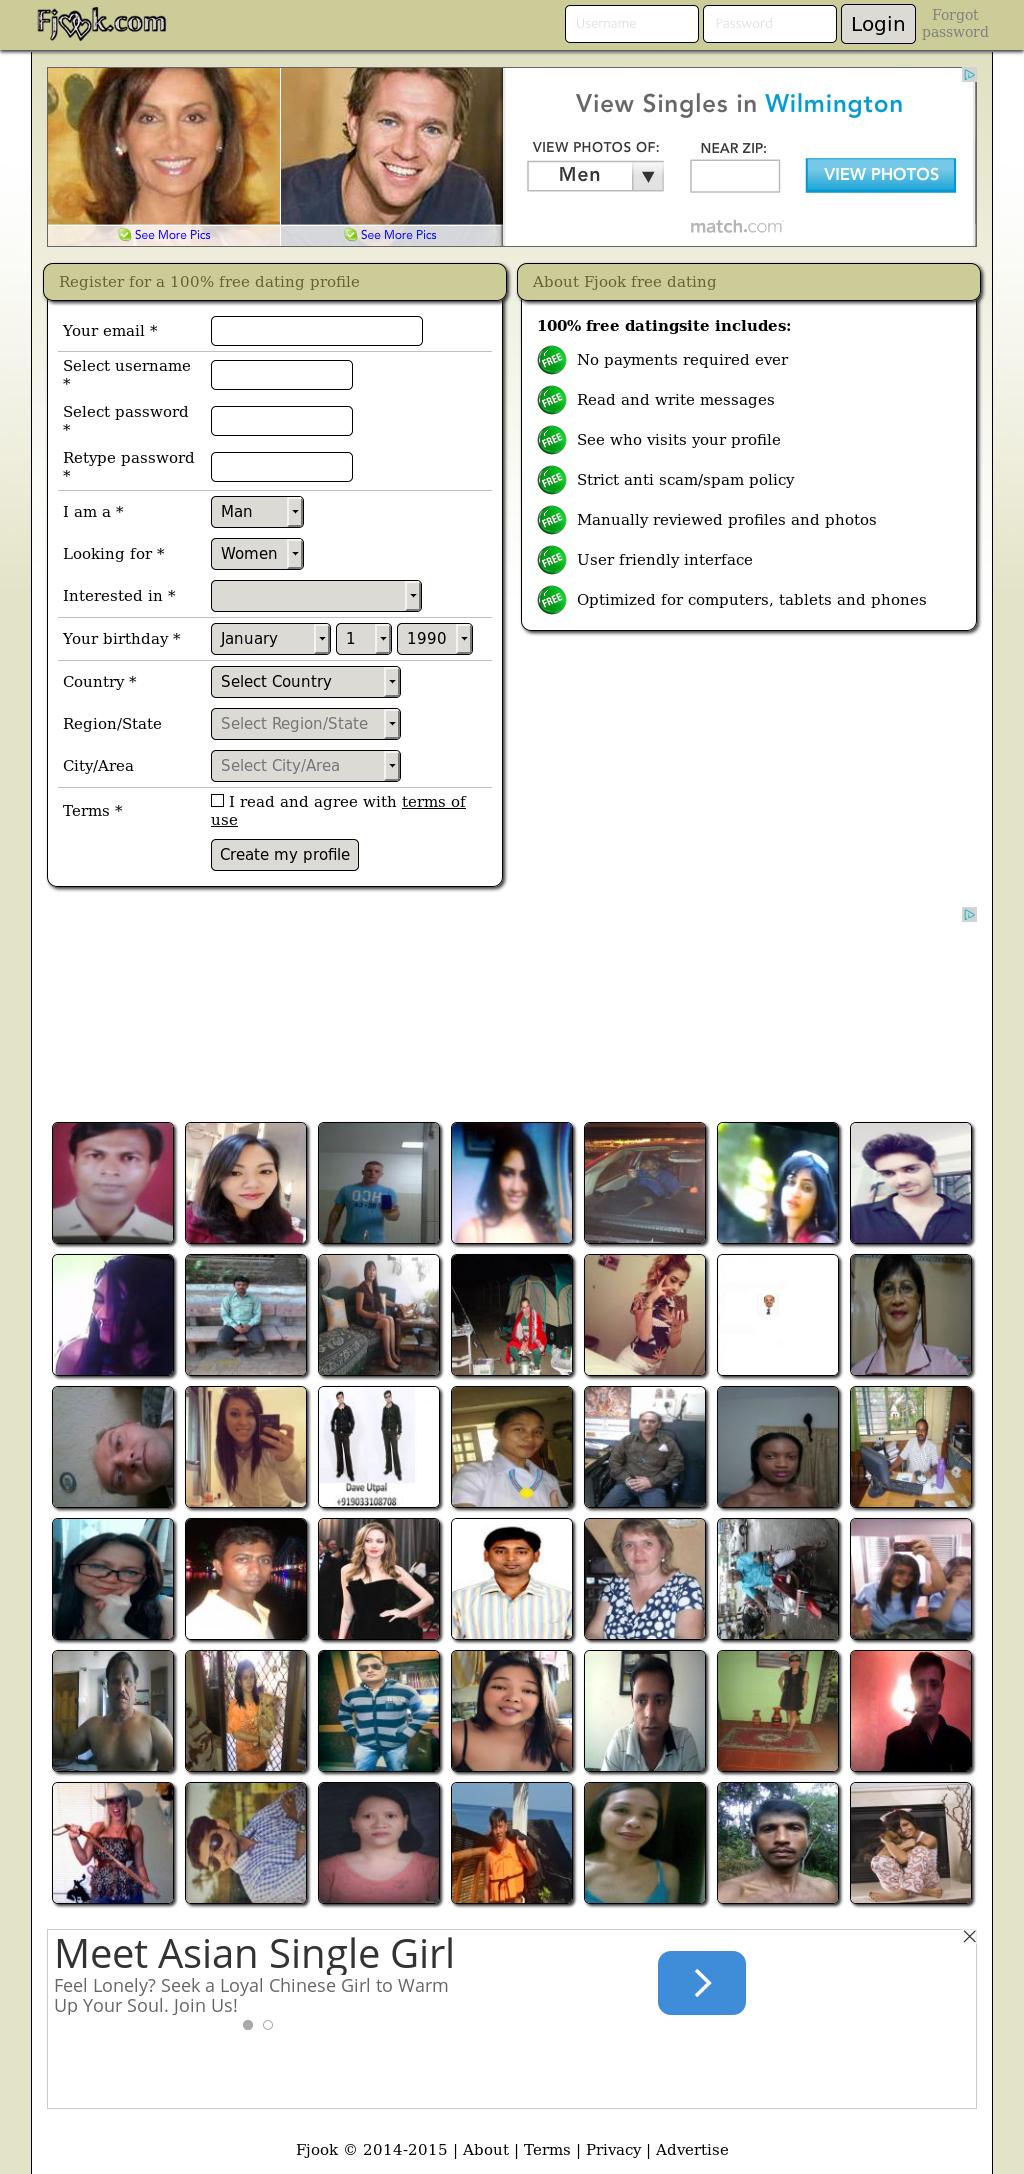 Iasip dating profile